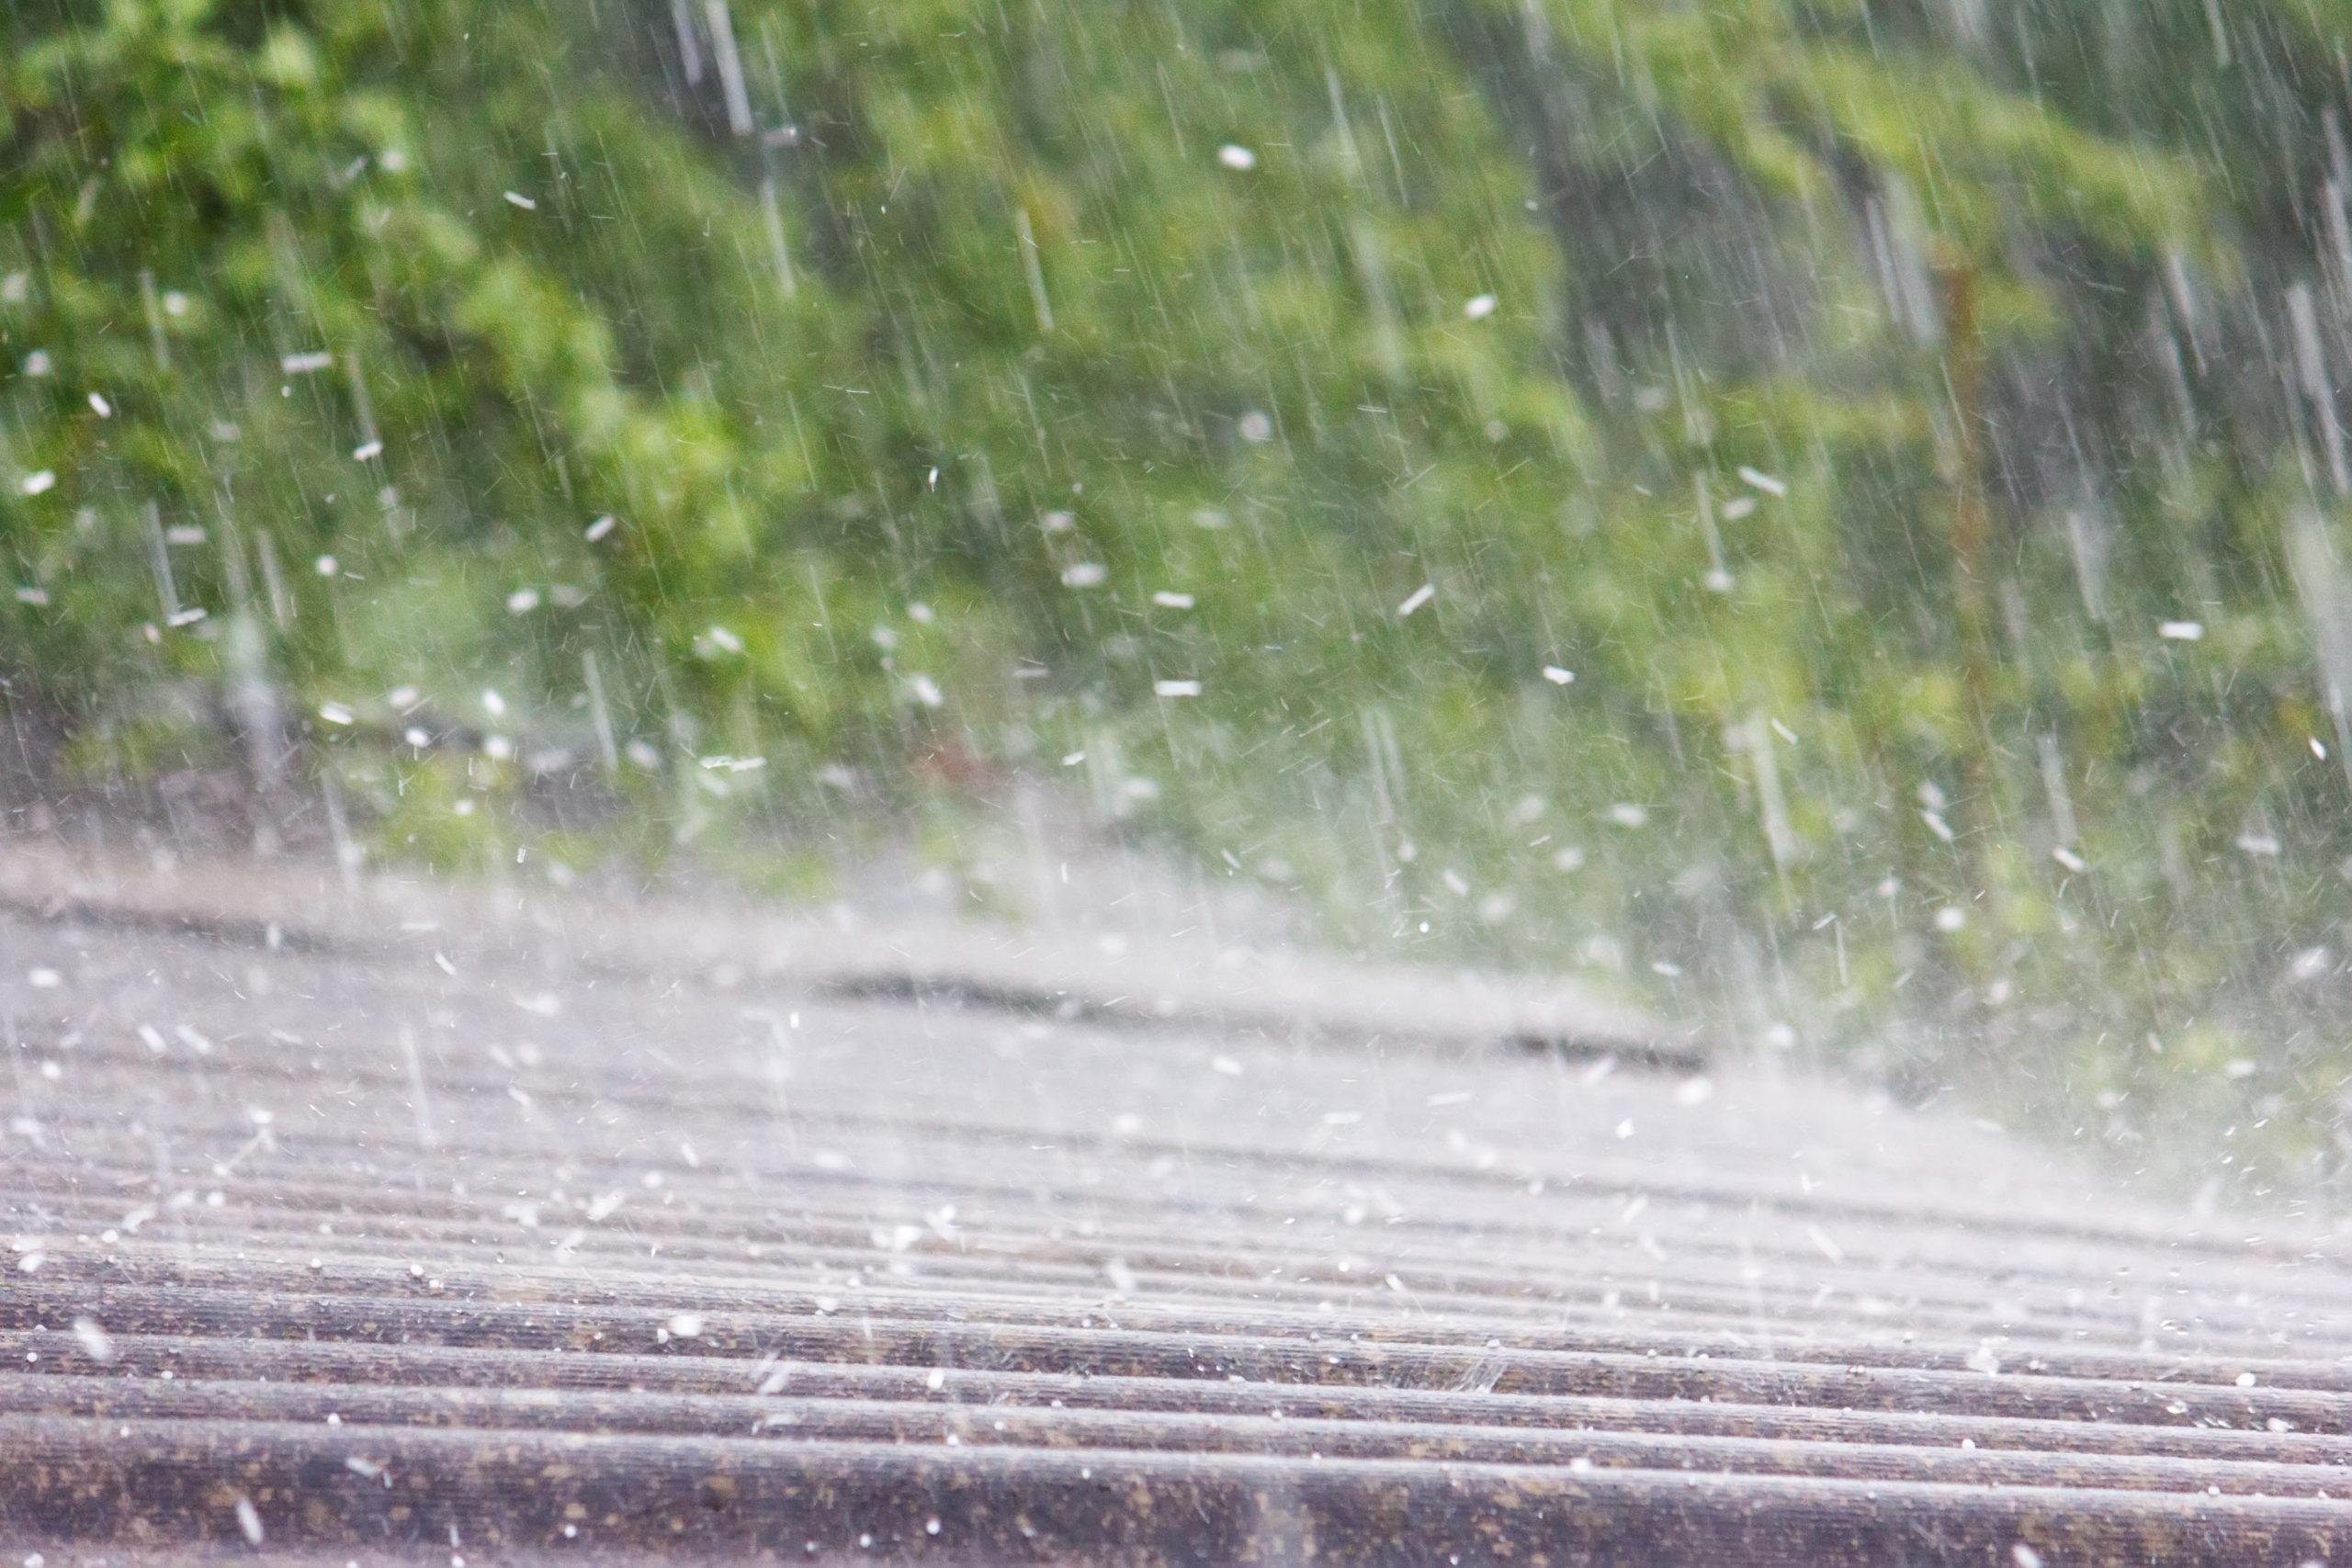 Hail hitting a roof